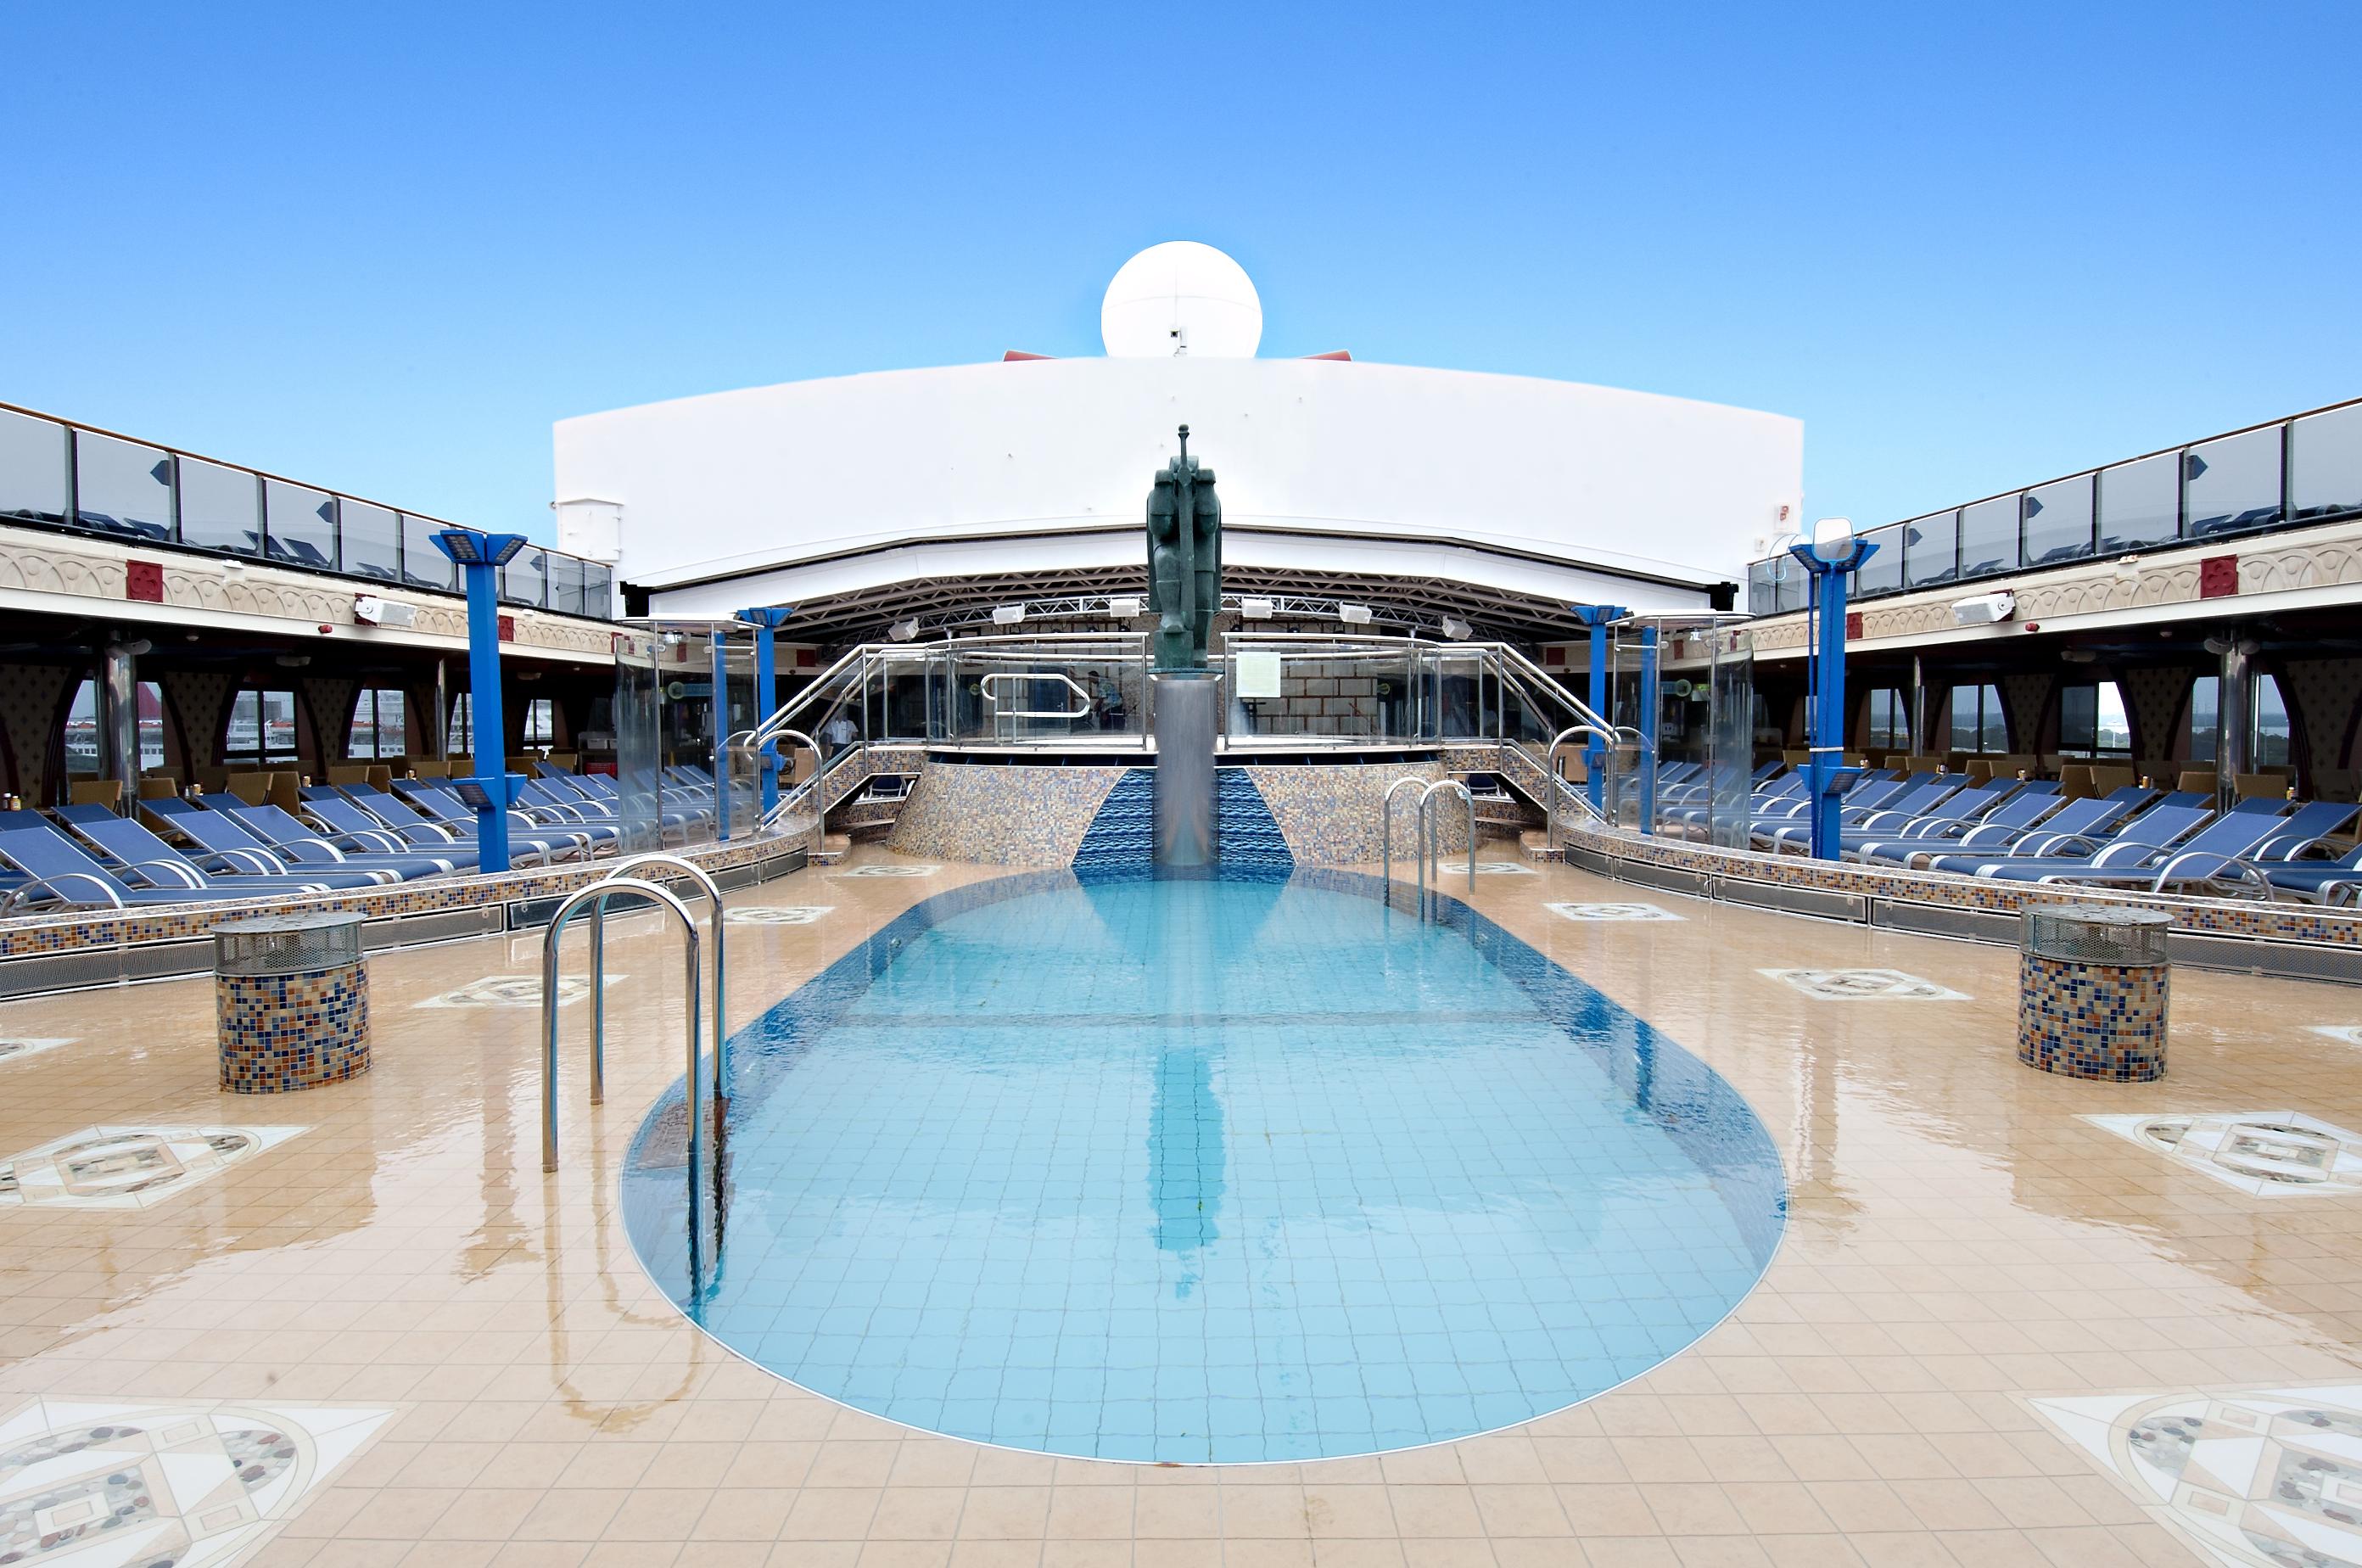 Carnival Legend Avalon Pool 2.jpg